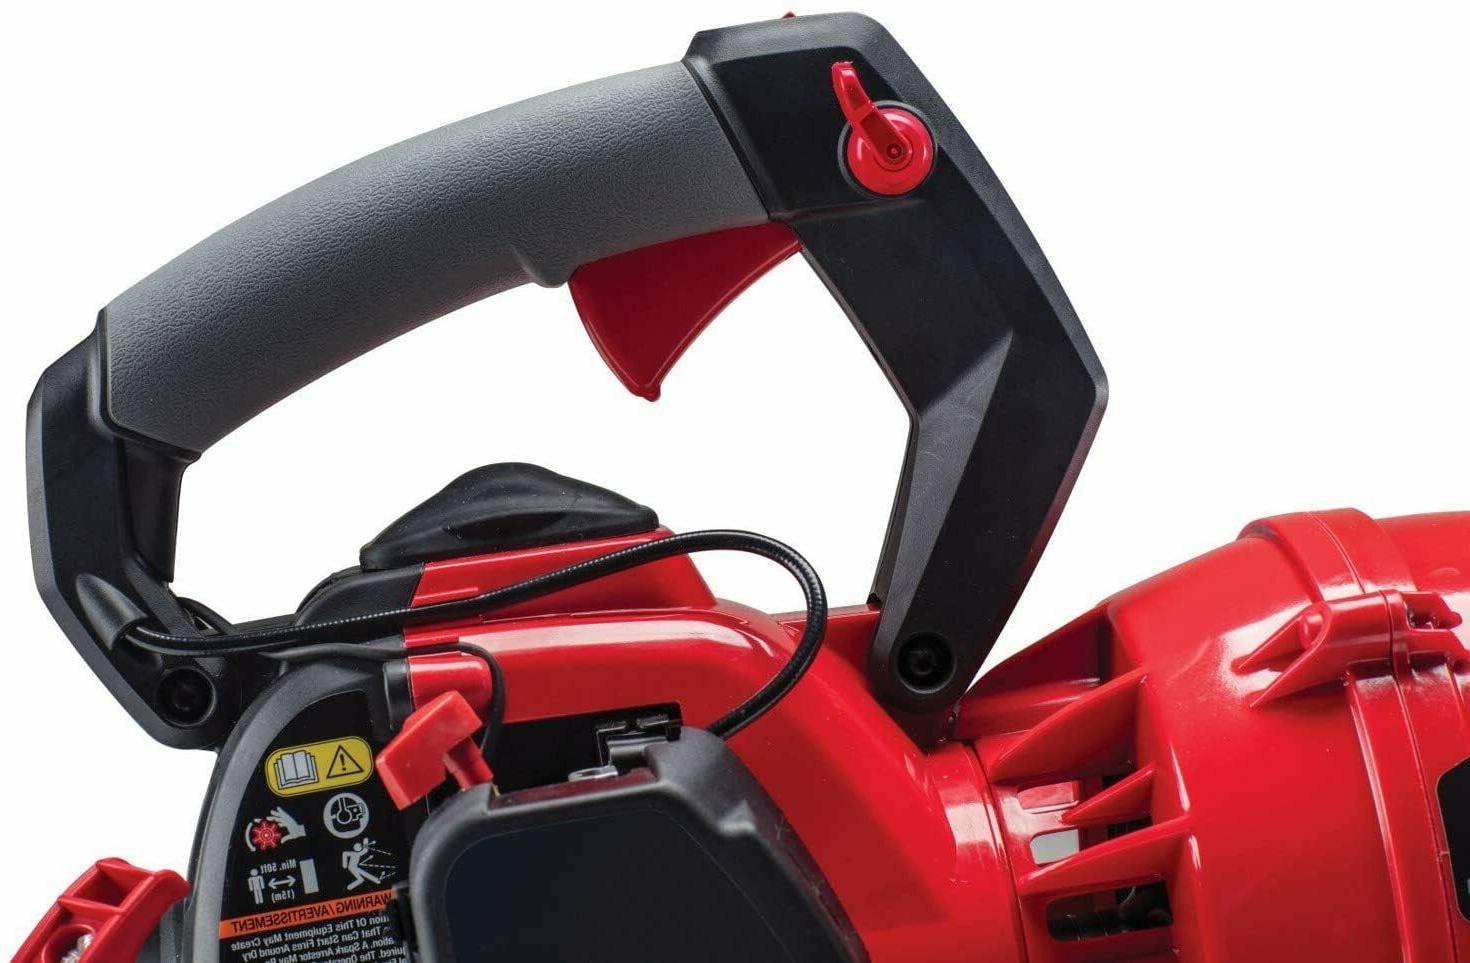 Craftsman Blower B225 MPH 27cc, 2-Cycle CMXGAAMR27MF